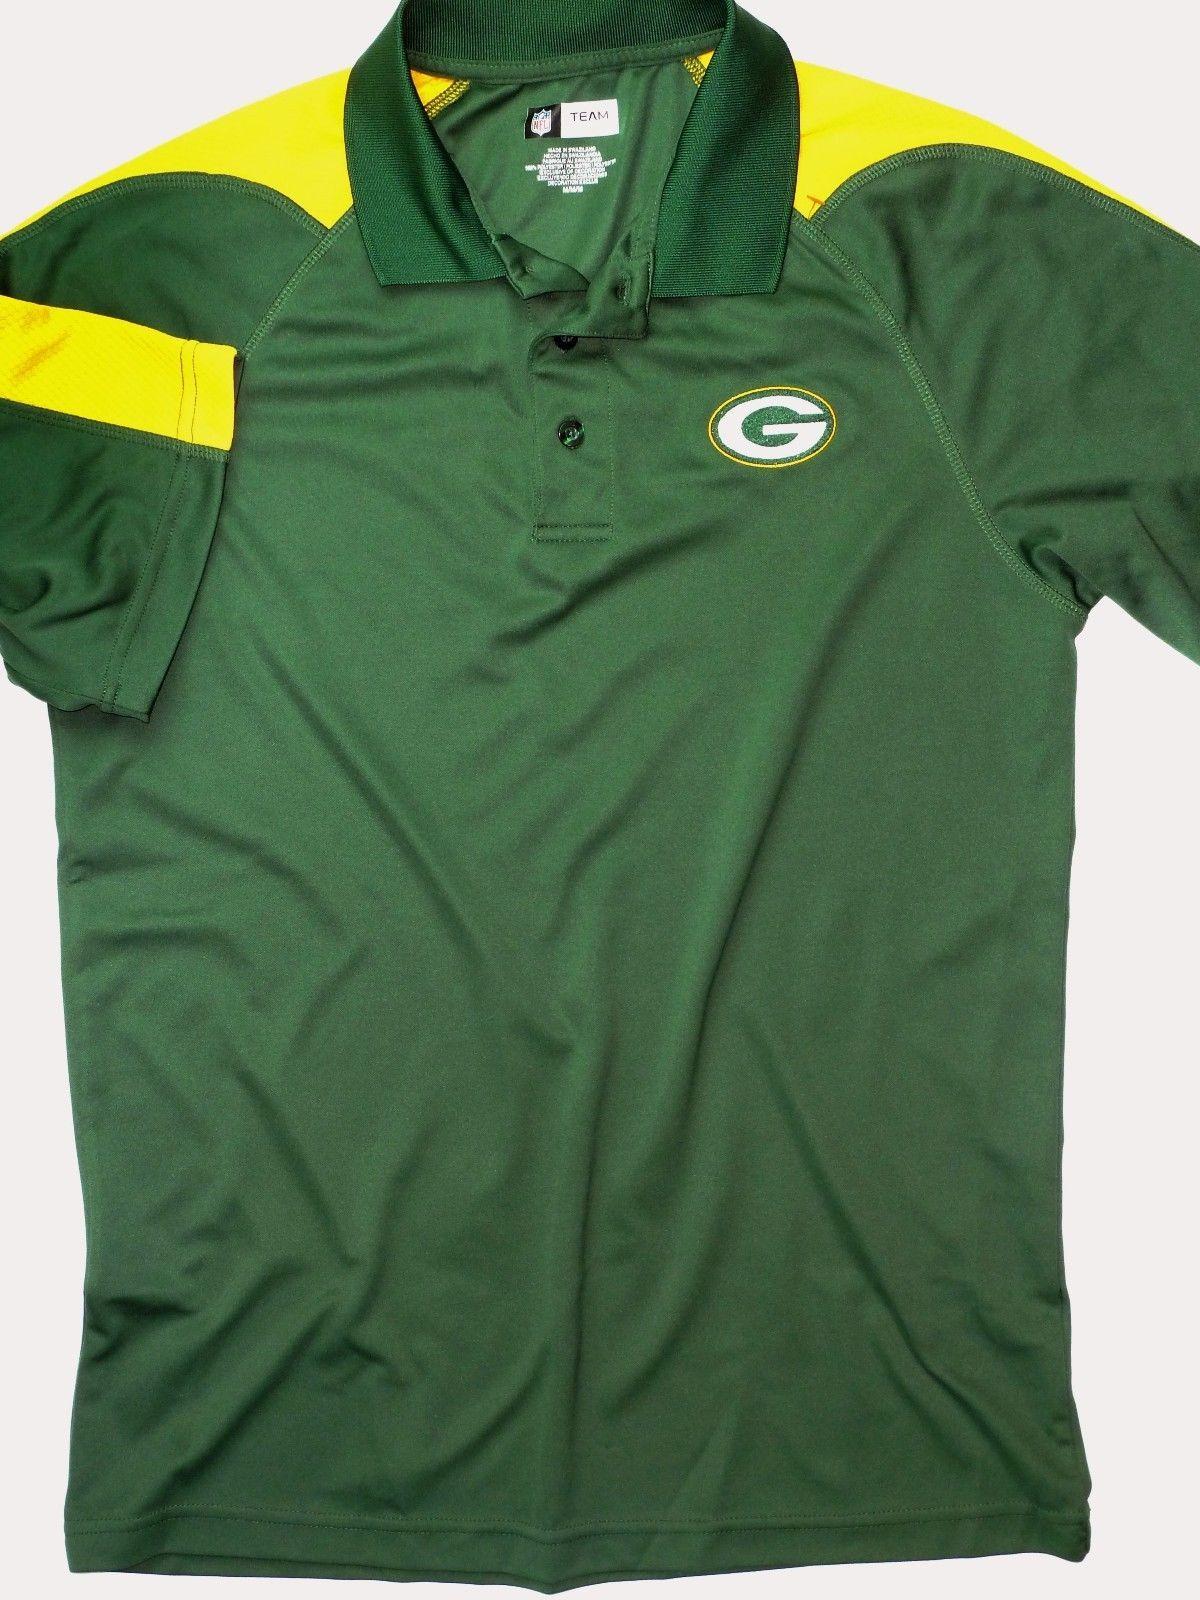 Fantastic Mens Green Bay Packers Nfl Team Apparel Polo Size Medium